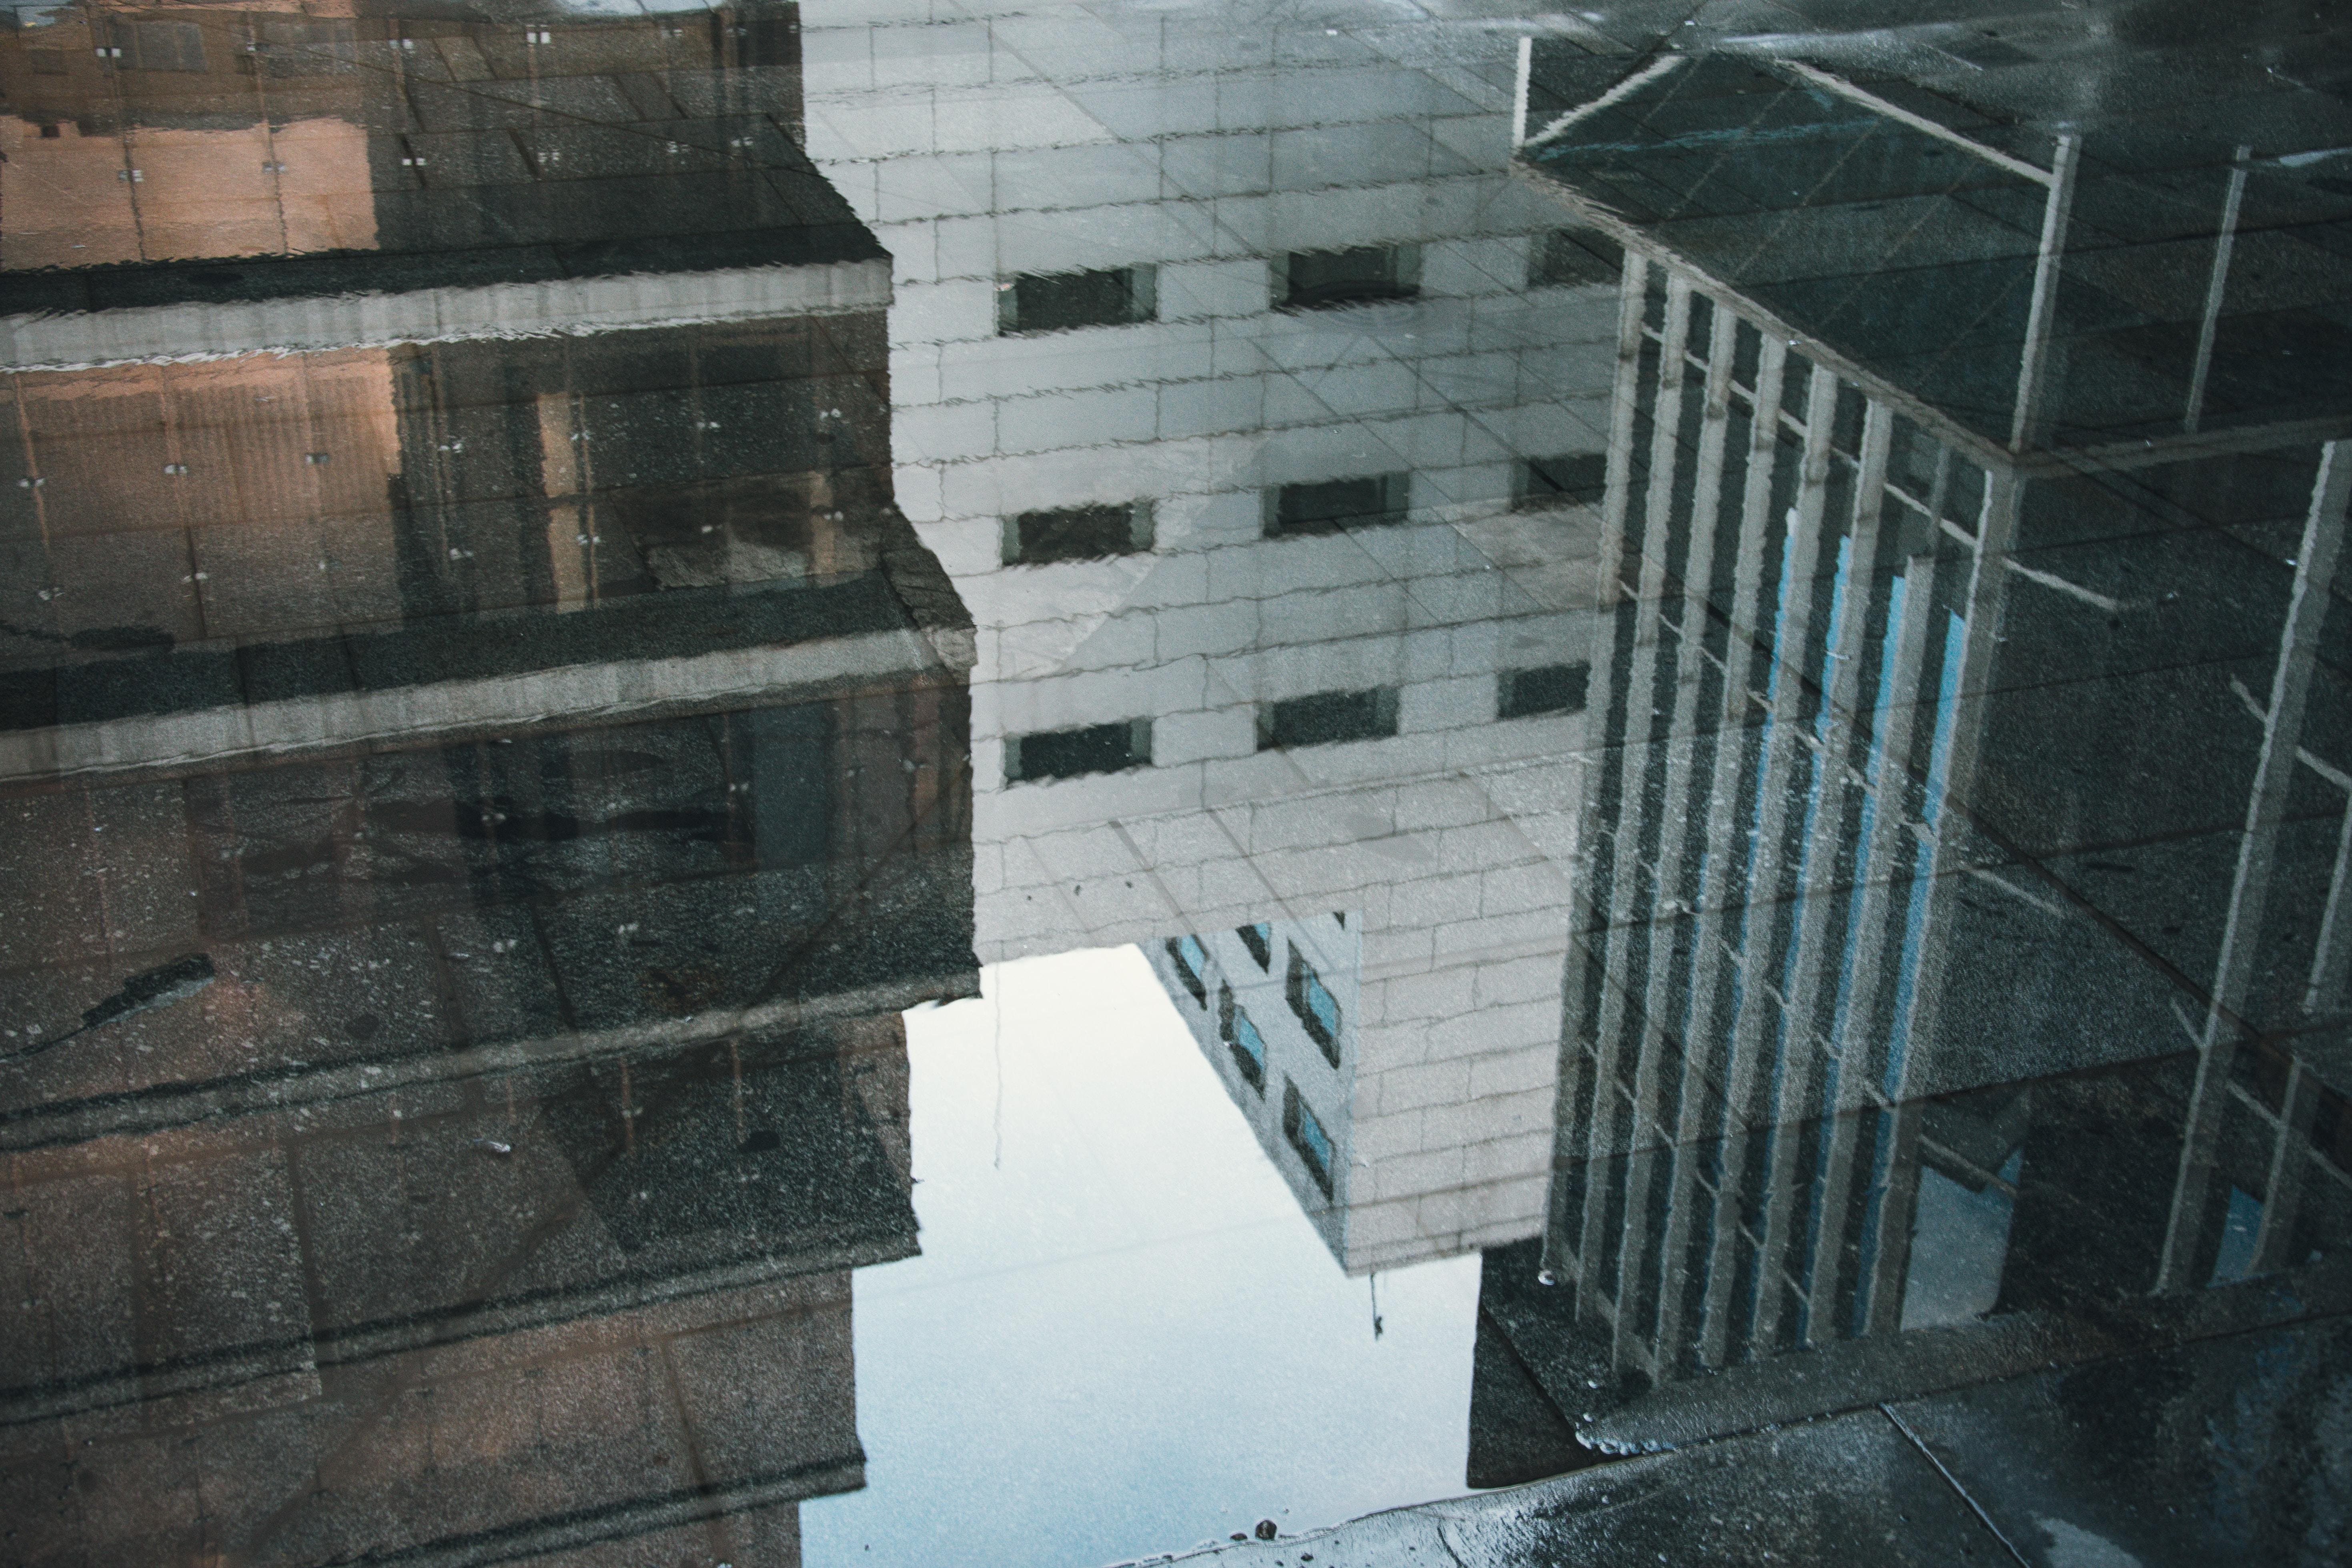 reflection of buildings in water on floor